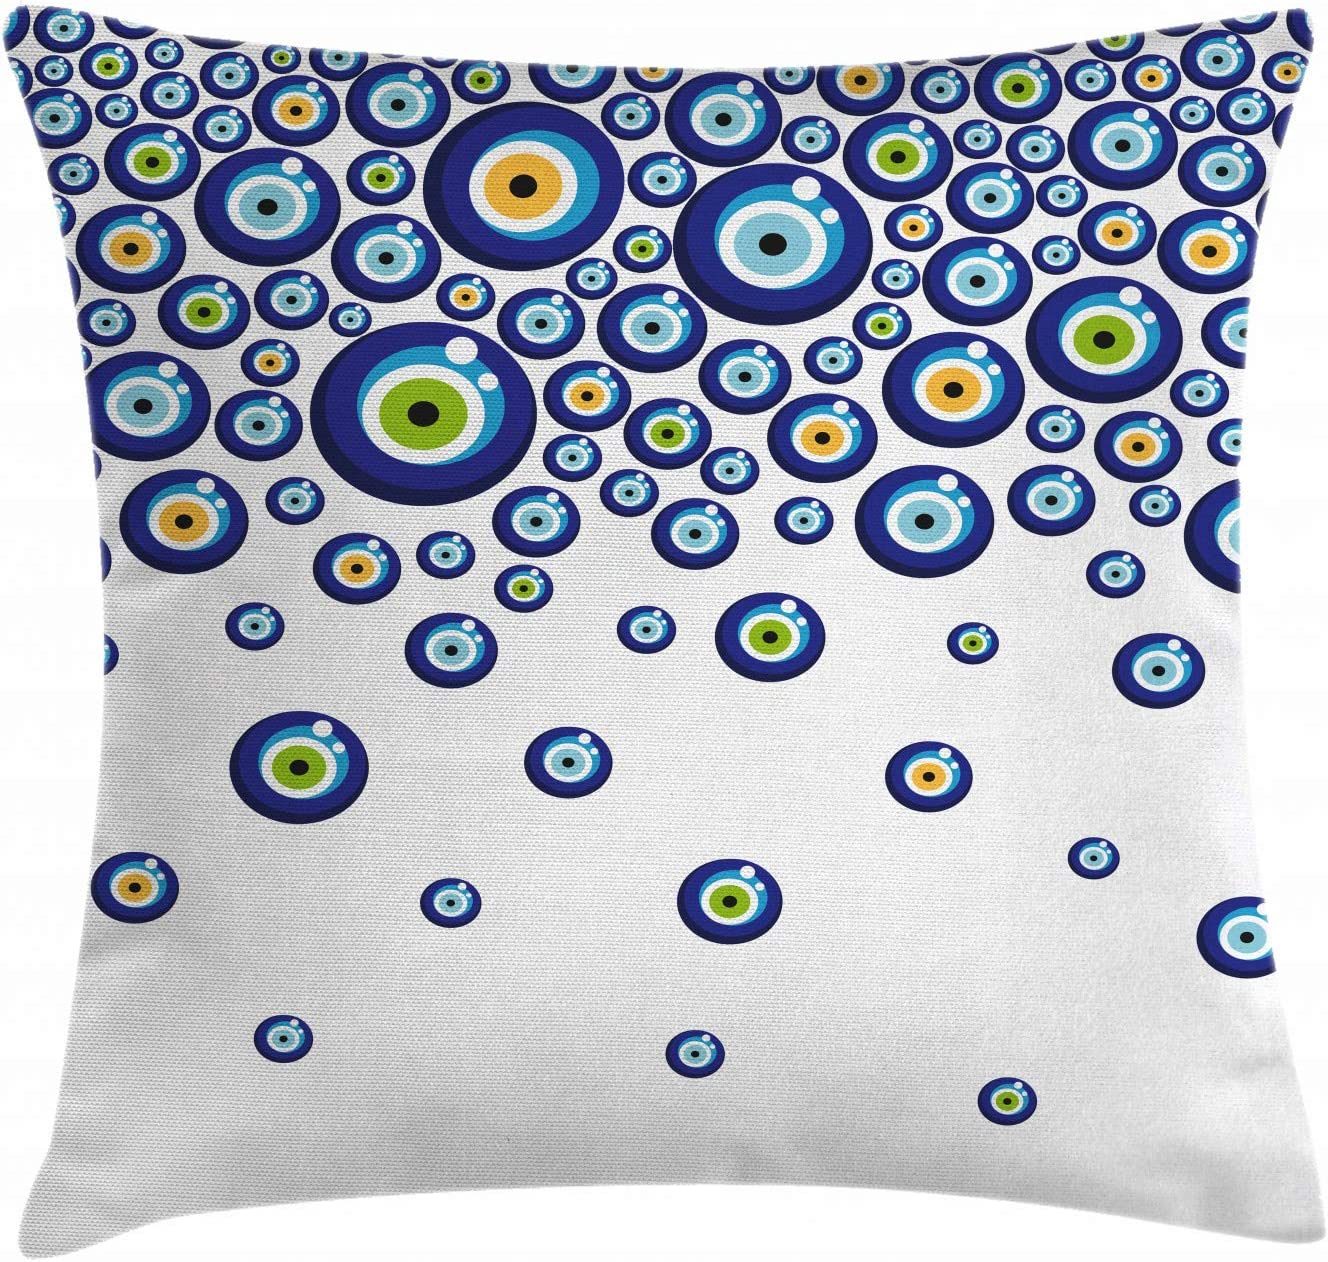 Resistente a Manchas Material Lavable Colores Firmes No Desti/ñen Cal/éndula Verde Azul ABAKUHAUS Mal De Ojo Mantele Amuletos Turcos Animados 140 x 200 cm